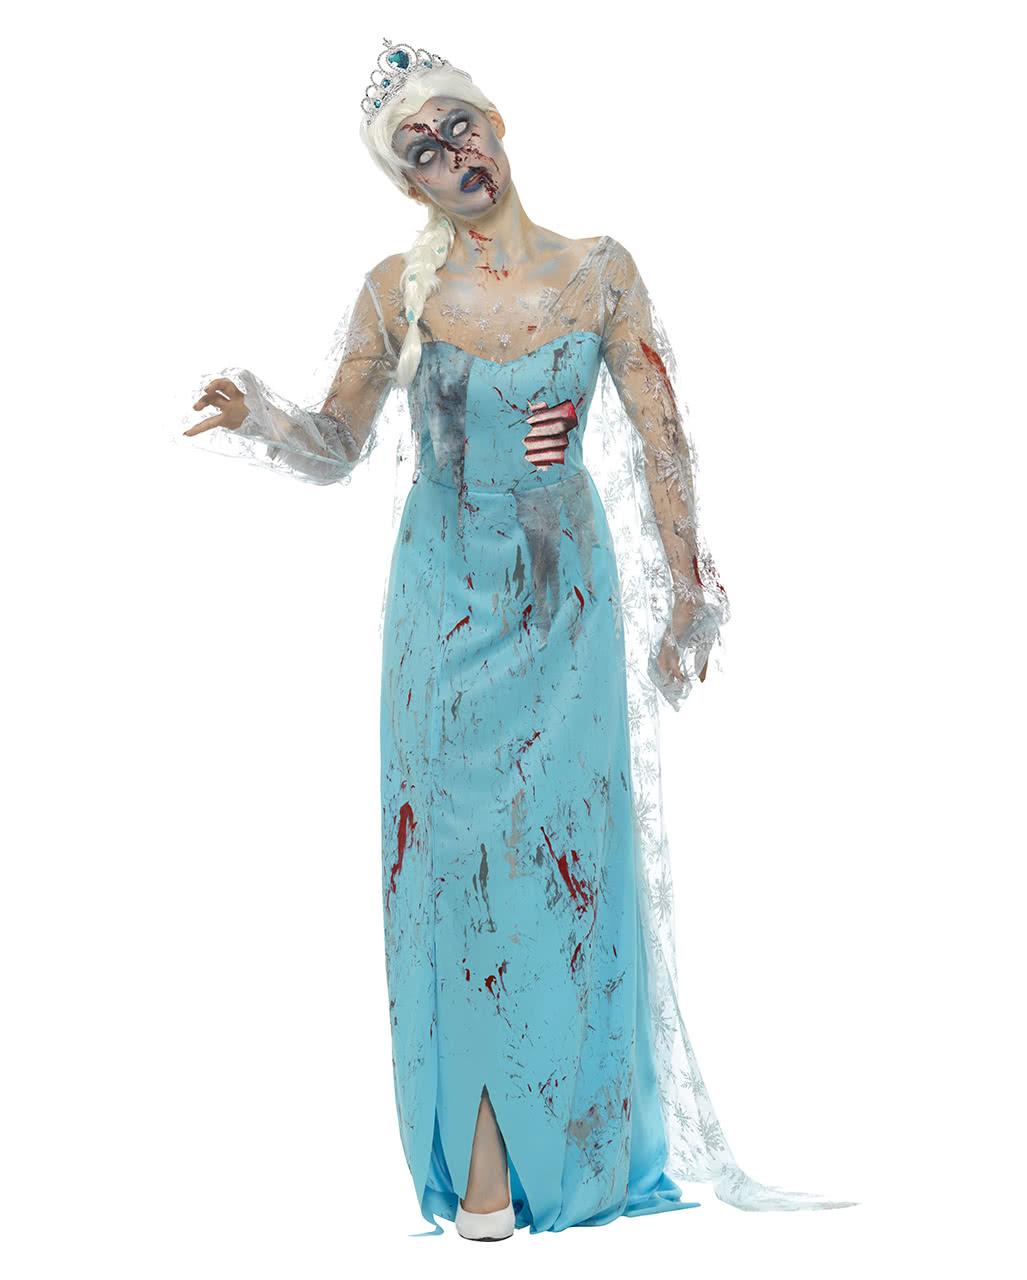 Zombie Ice Queen Costume | Horrormal paneling | horror-shop.com